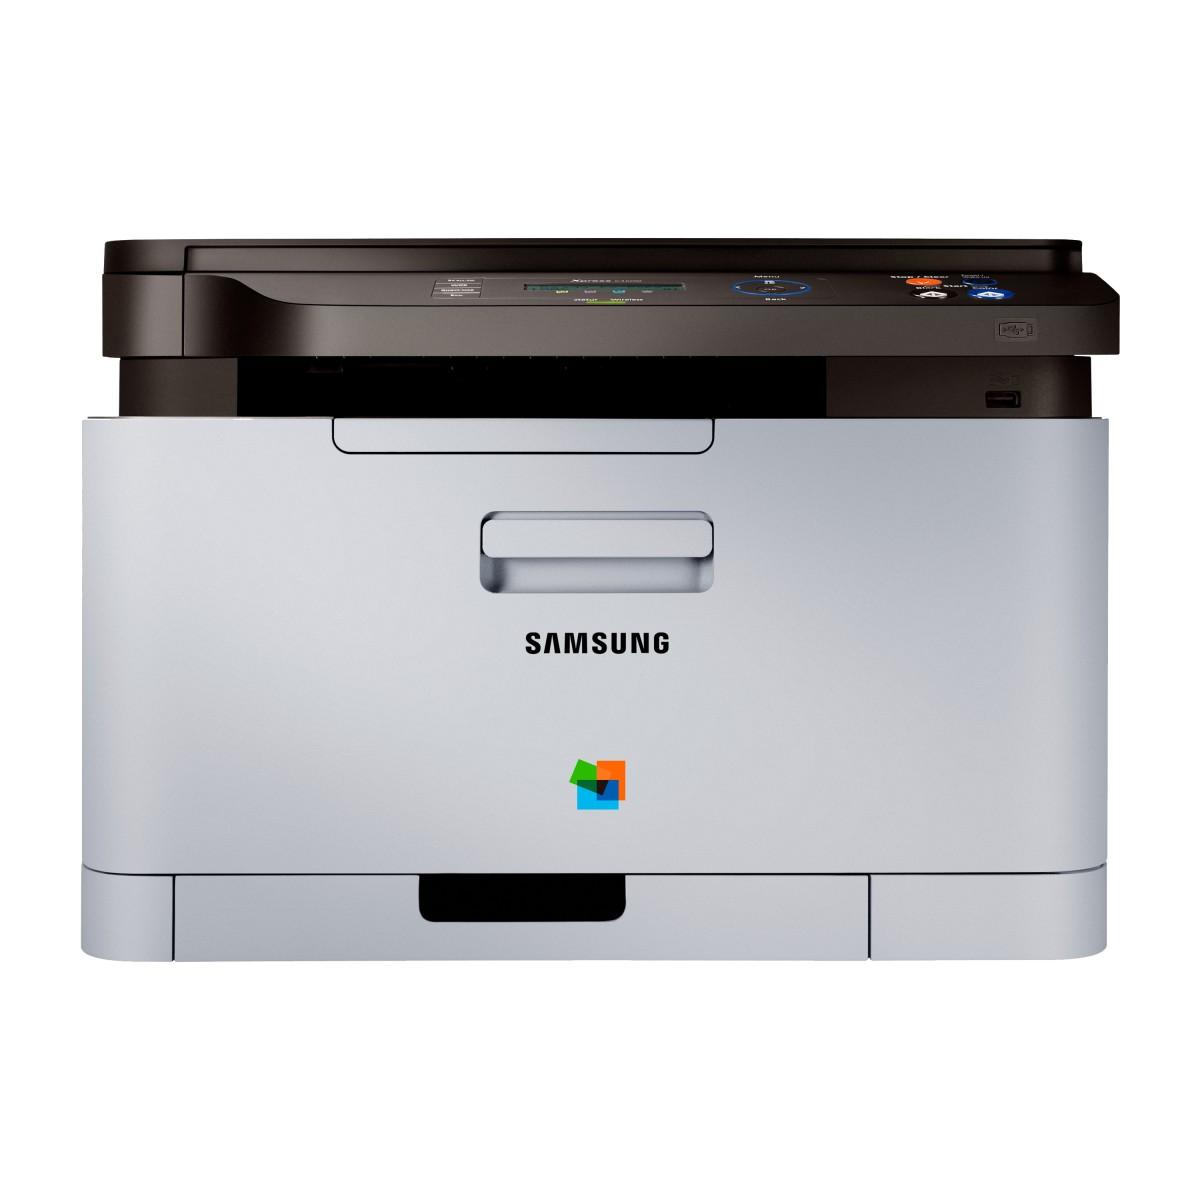 Impressora Multifuncional Samsung Xpress SL-C460W Laser Colorida  - ShopNoroeste.com.br